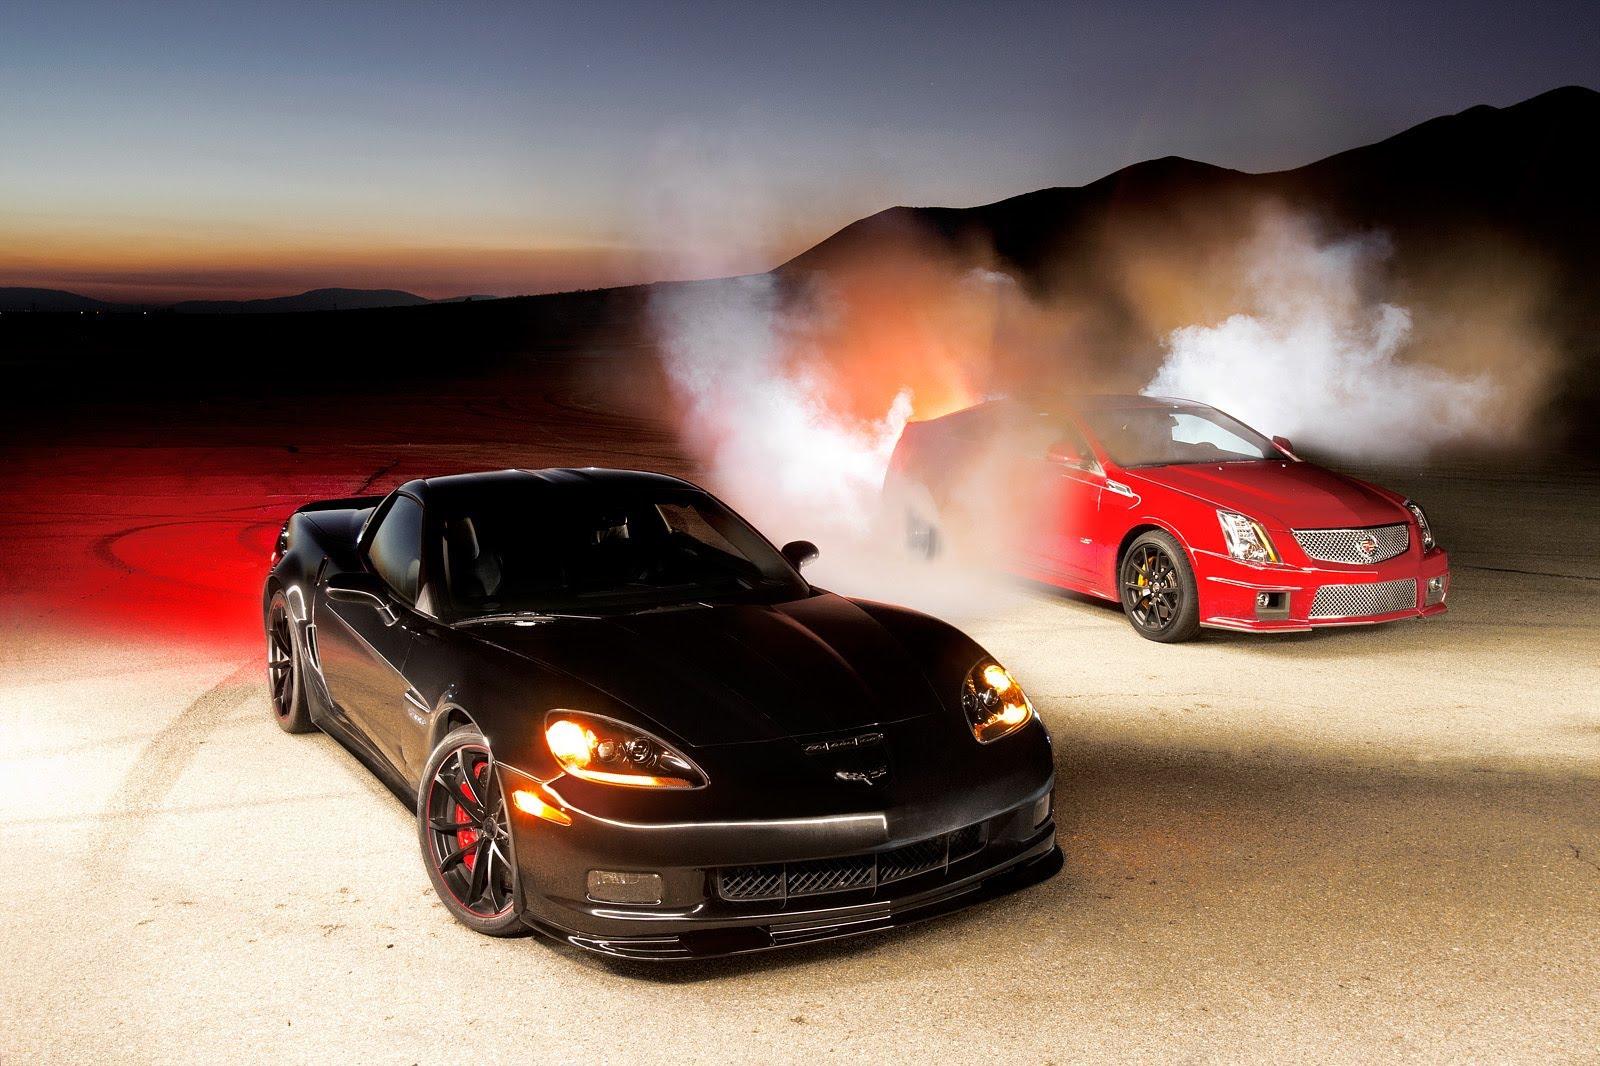 2012 Corvette Z06 Centennial Edition vs. Cadillac CTS-V Coupe